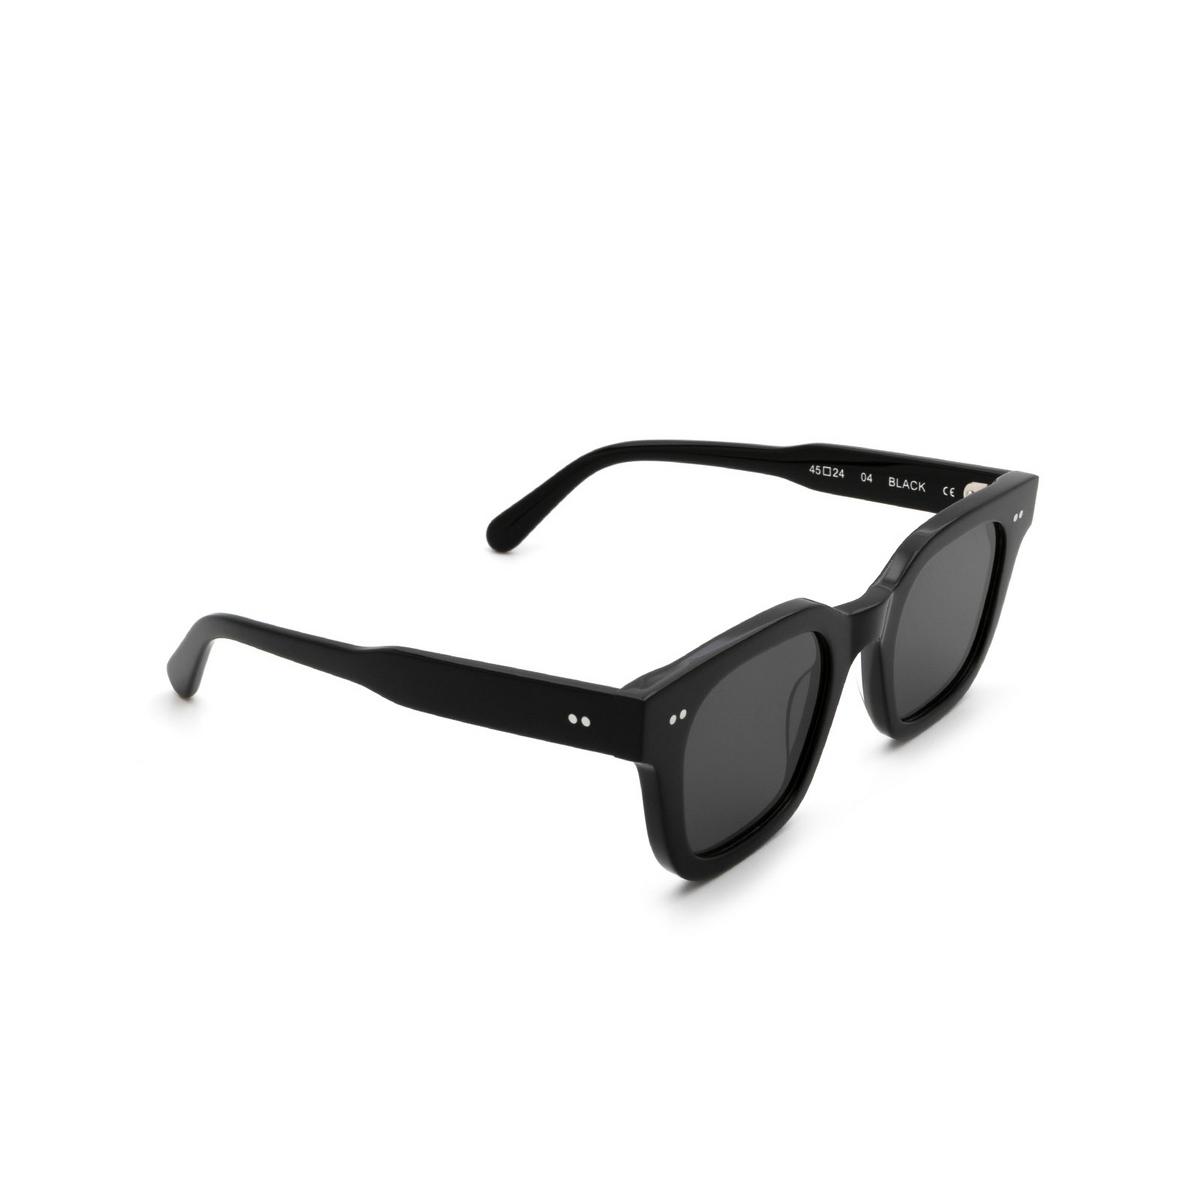 Chimi® Square Sunglasses: 04 color Black - three-quarters view.